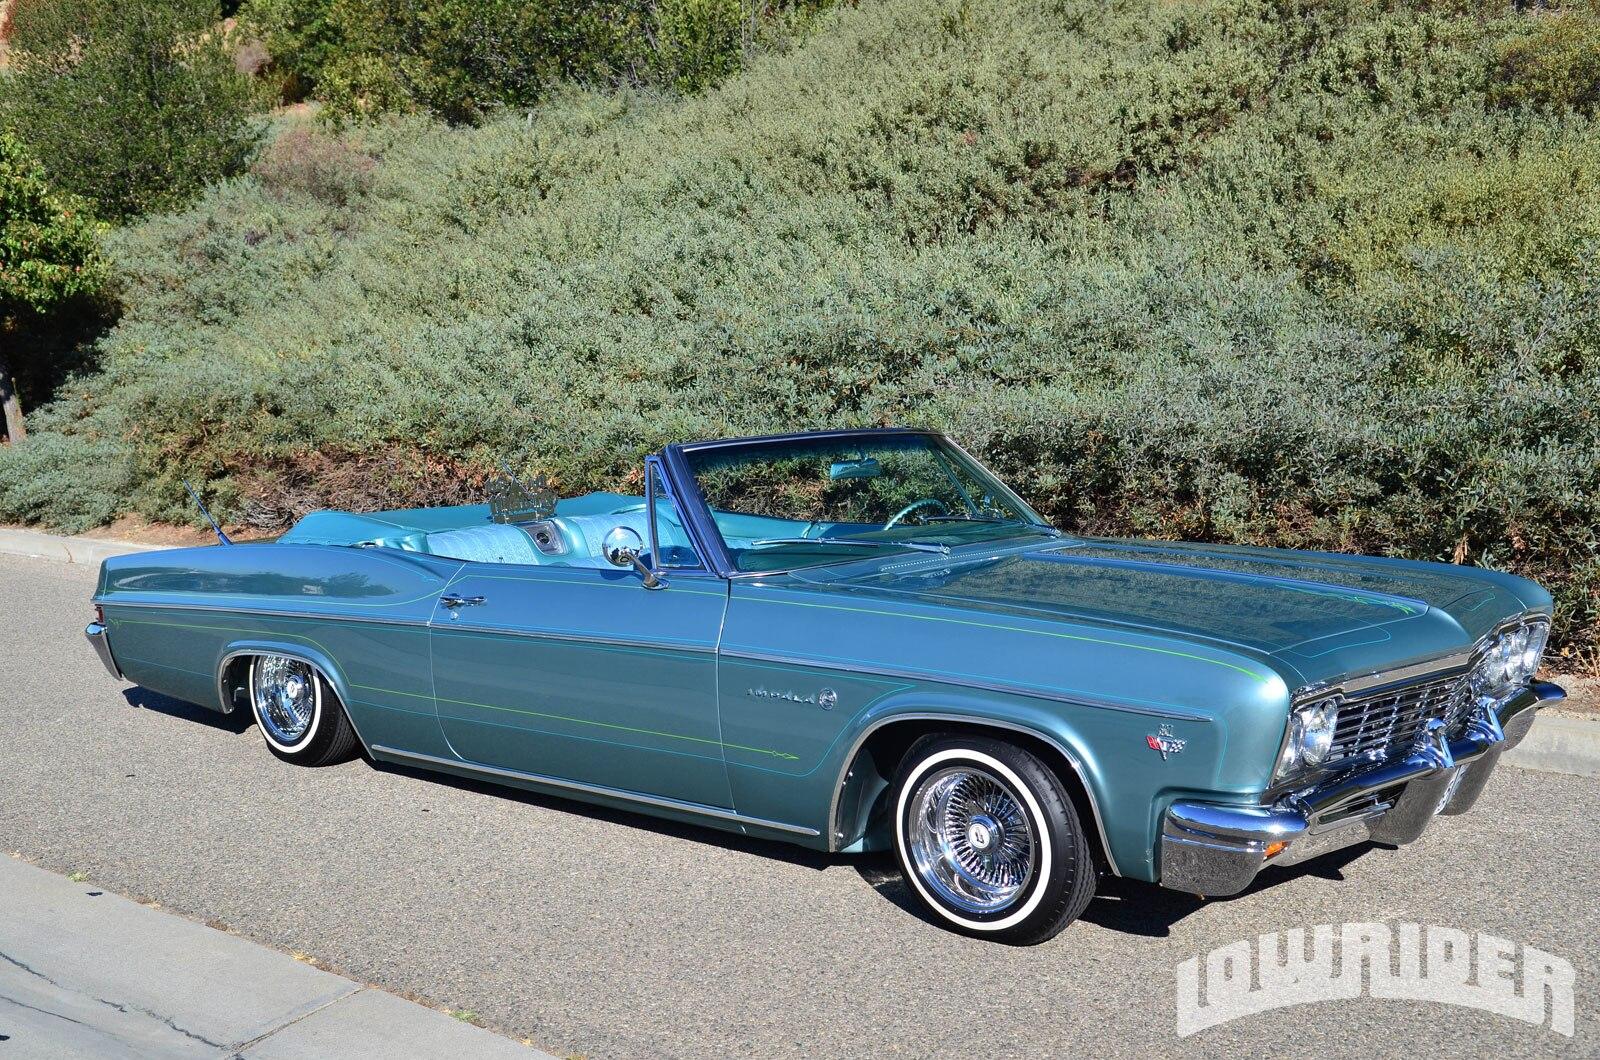 1957 Chevy Convertible Lowrider Impala